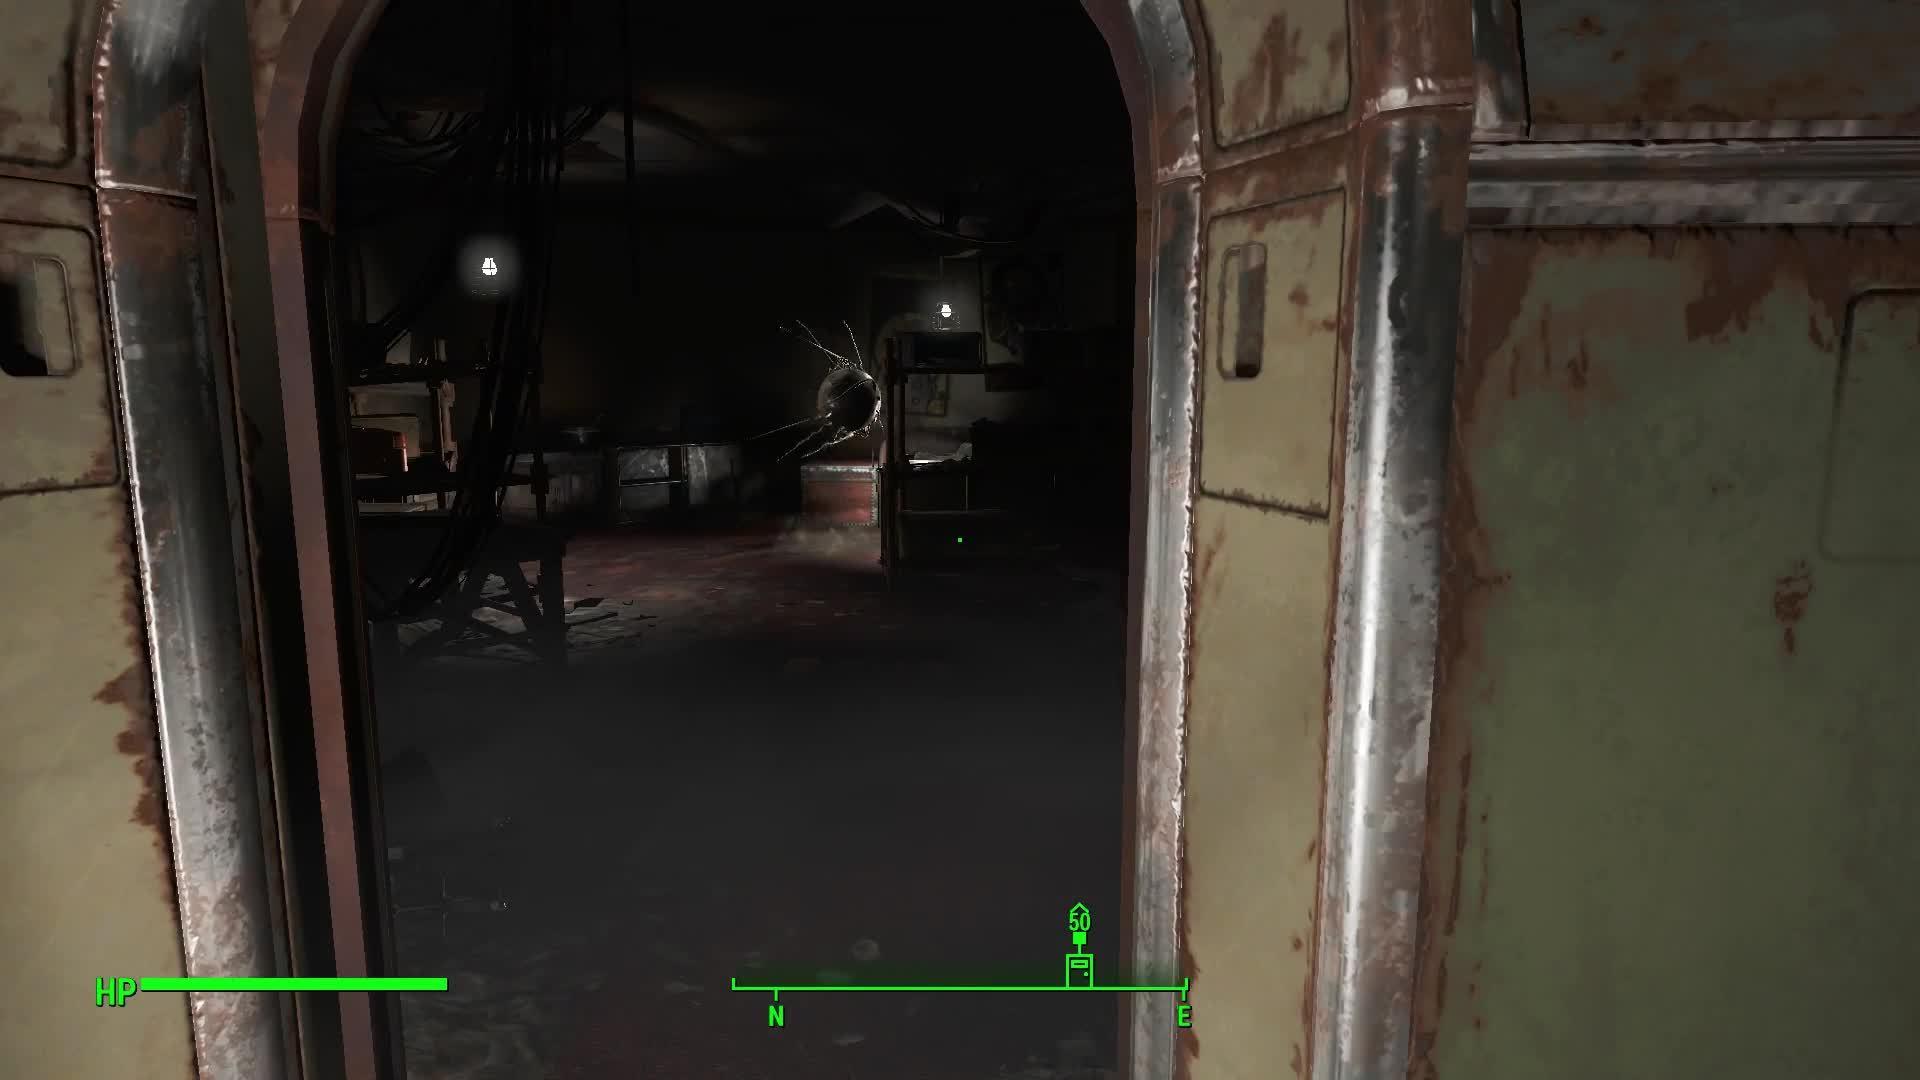 fo4, Mechanist Lair Hidden Room GIFs